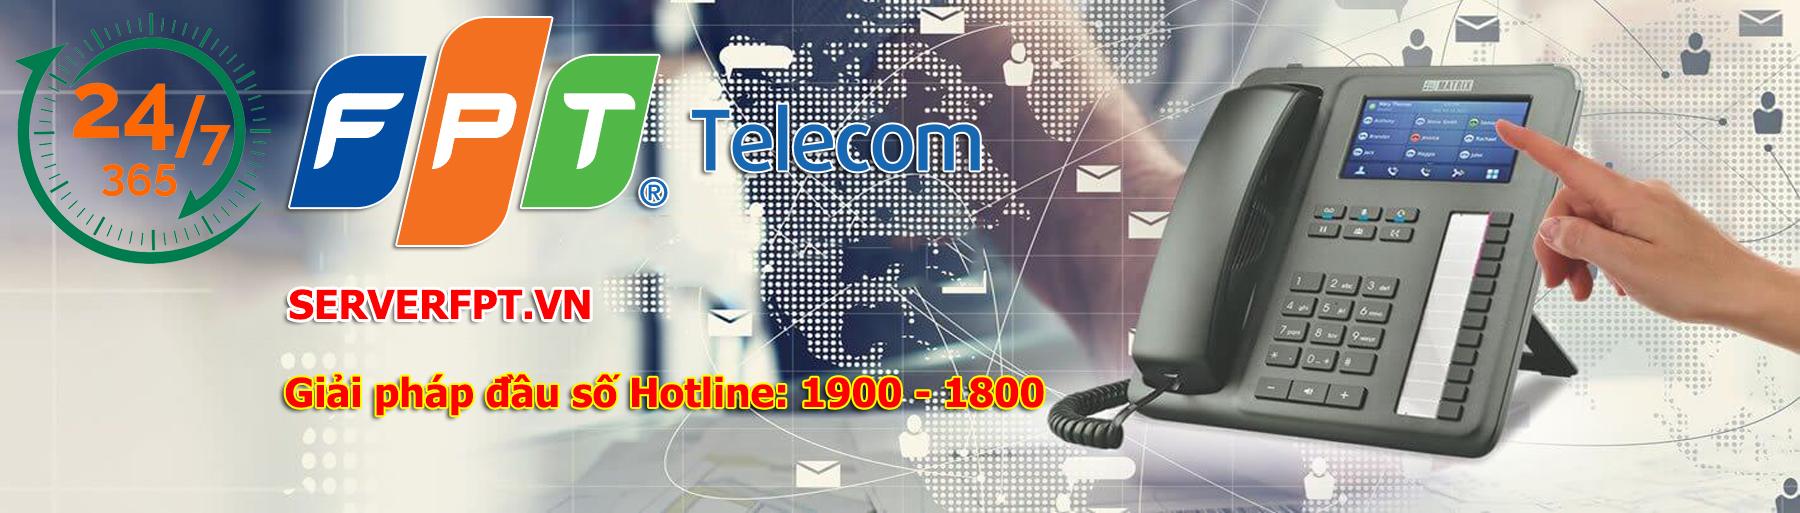 Đăng ký số Hotline FPT